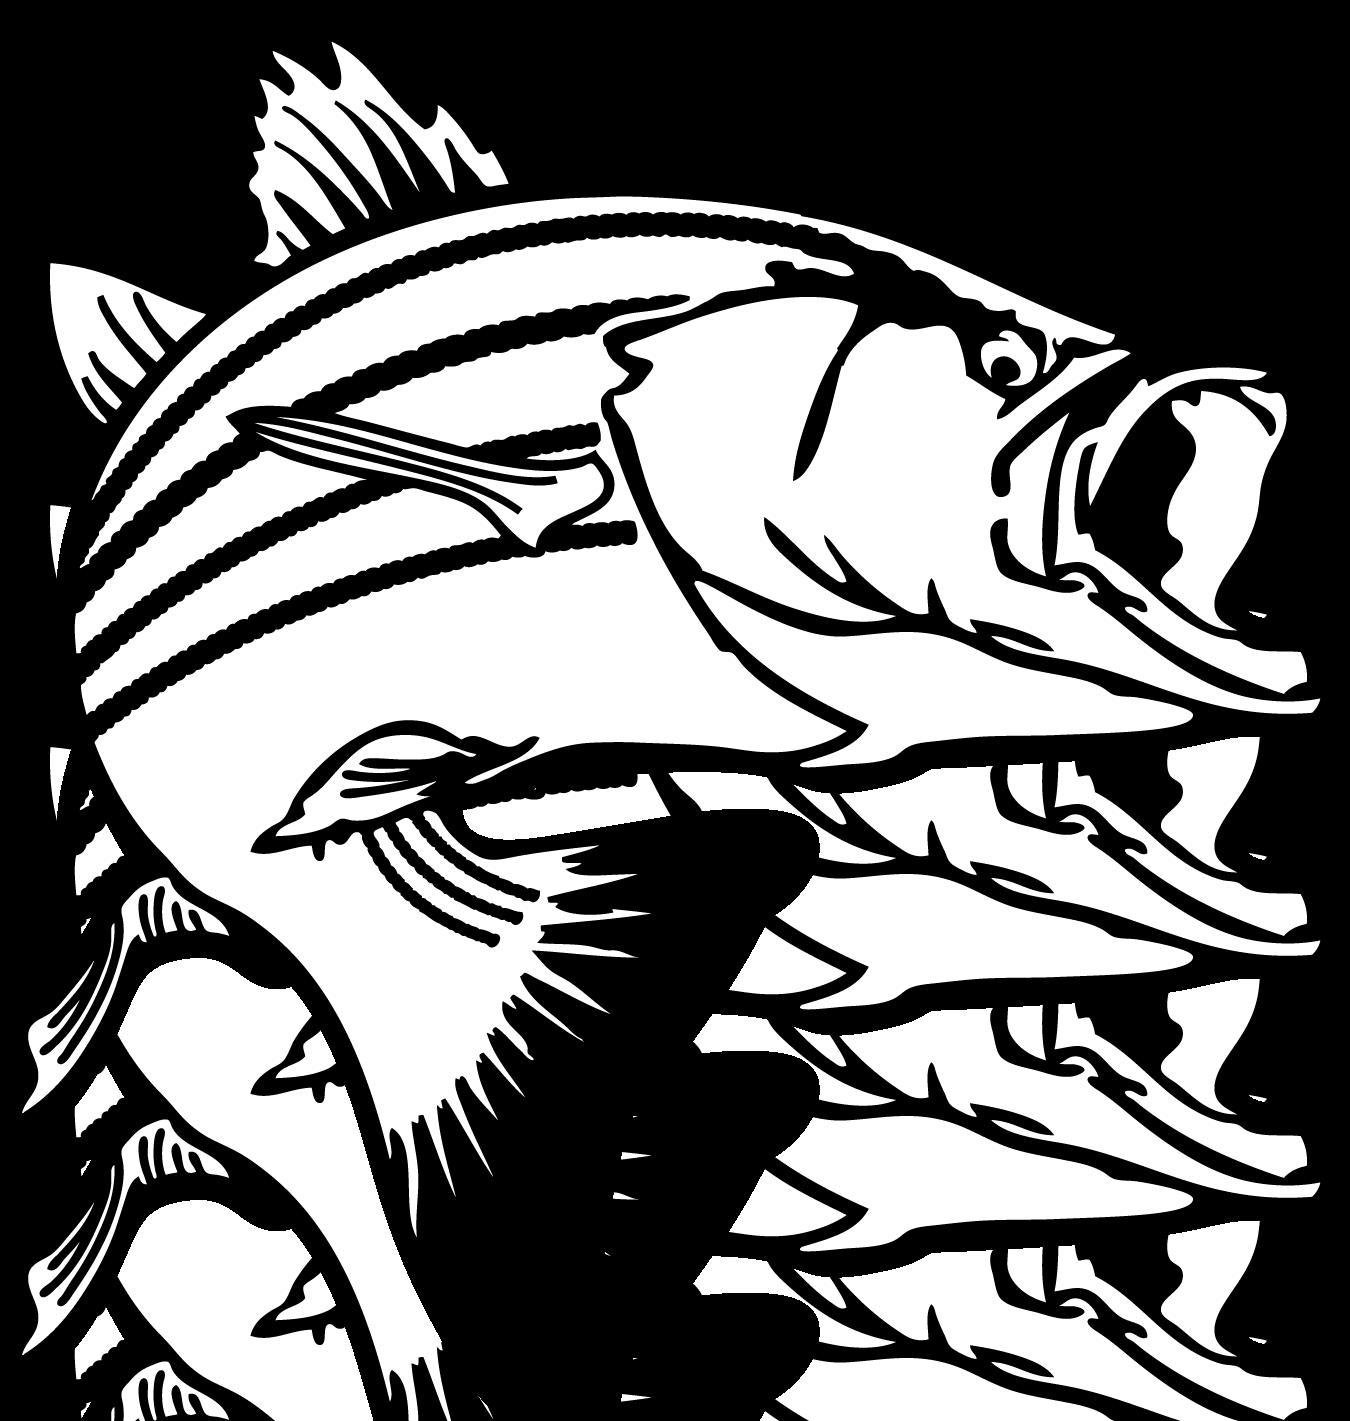 Freshwater fish jumping - Jumping Bass Fish Clip Art Clipart Panda Free Clipart Images